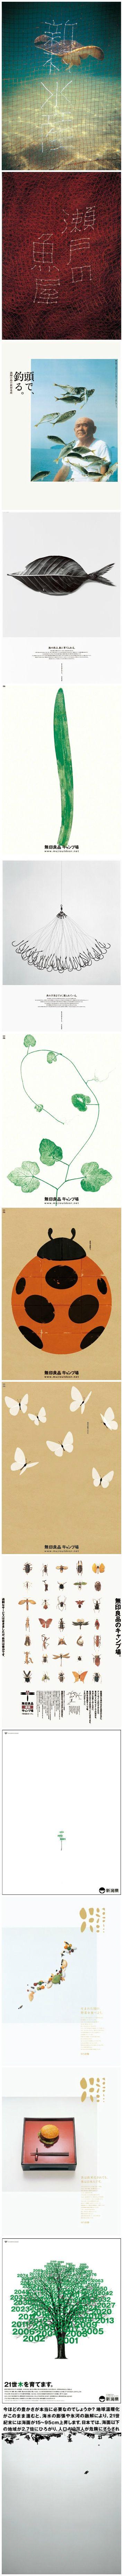 Japanese typographic poster designs by Norito Shinmura